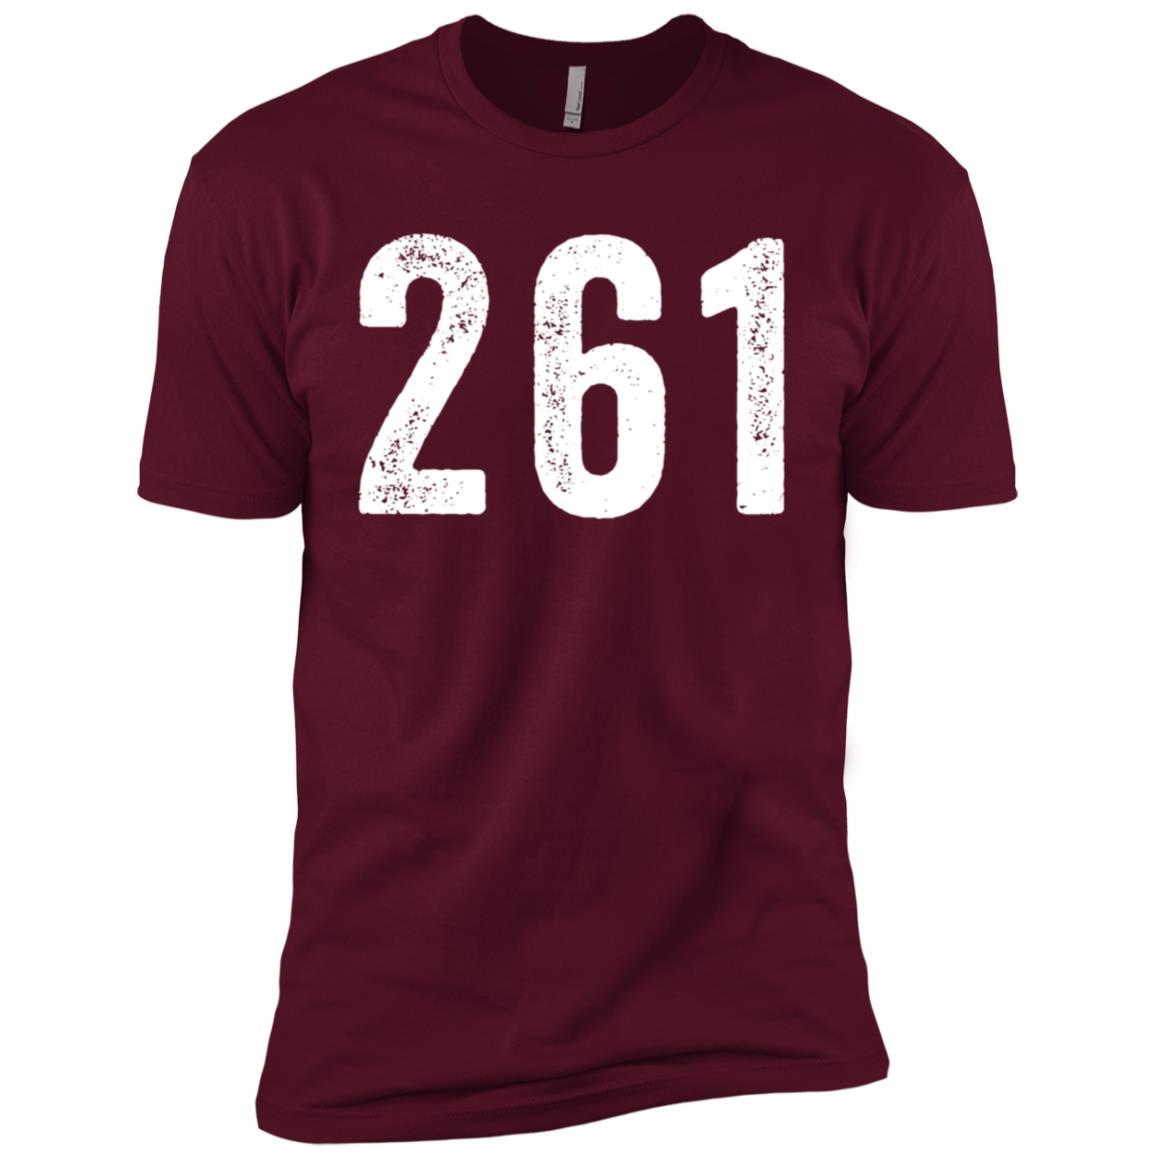 261 – Feminist Running Men Short Sleeve T-Shirt